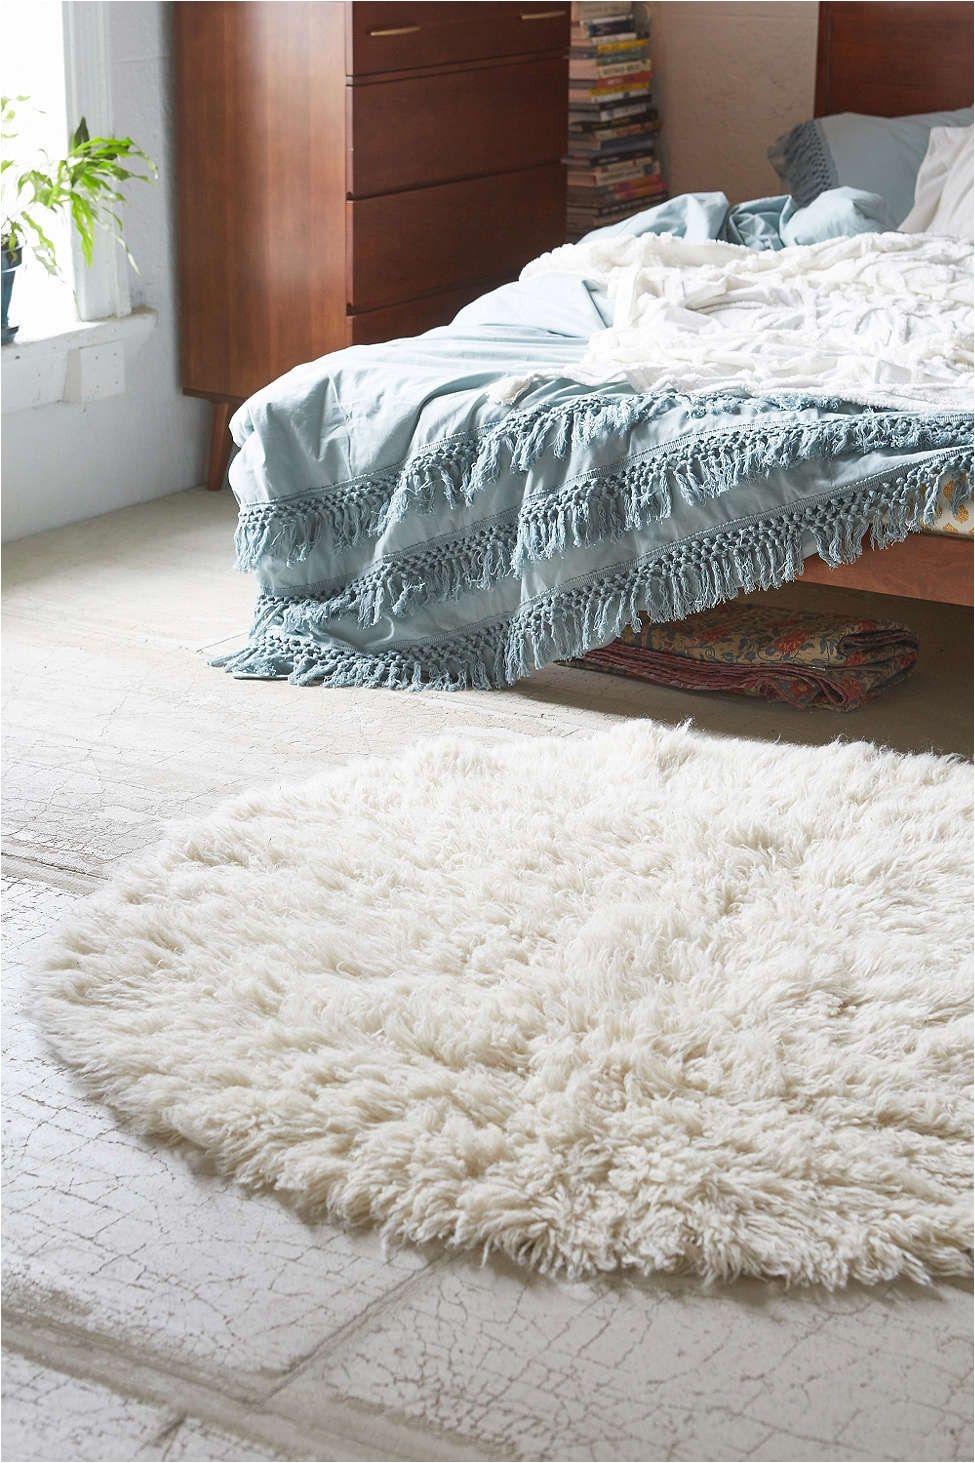 flokati shag rug love the texture so soft uooncampus uocontest